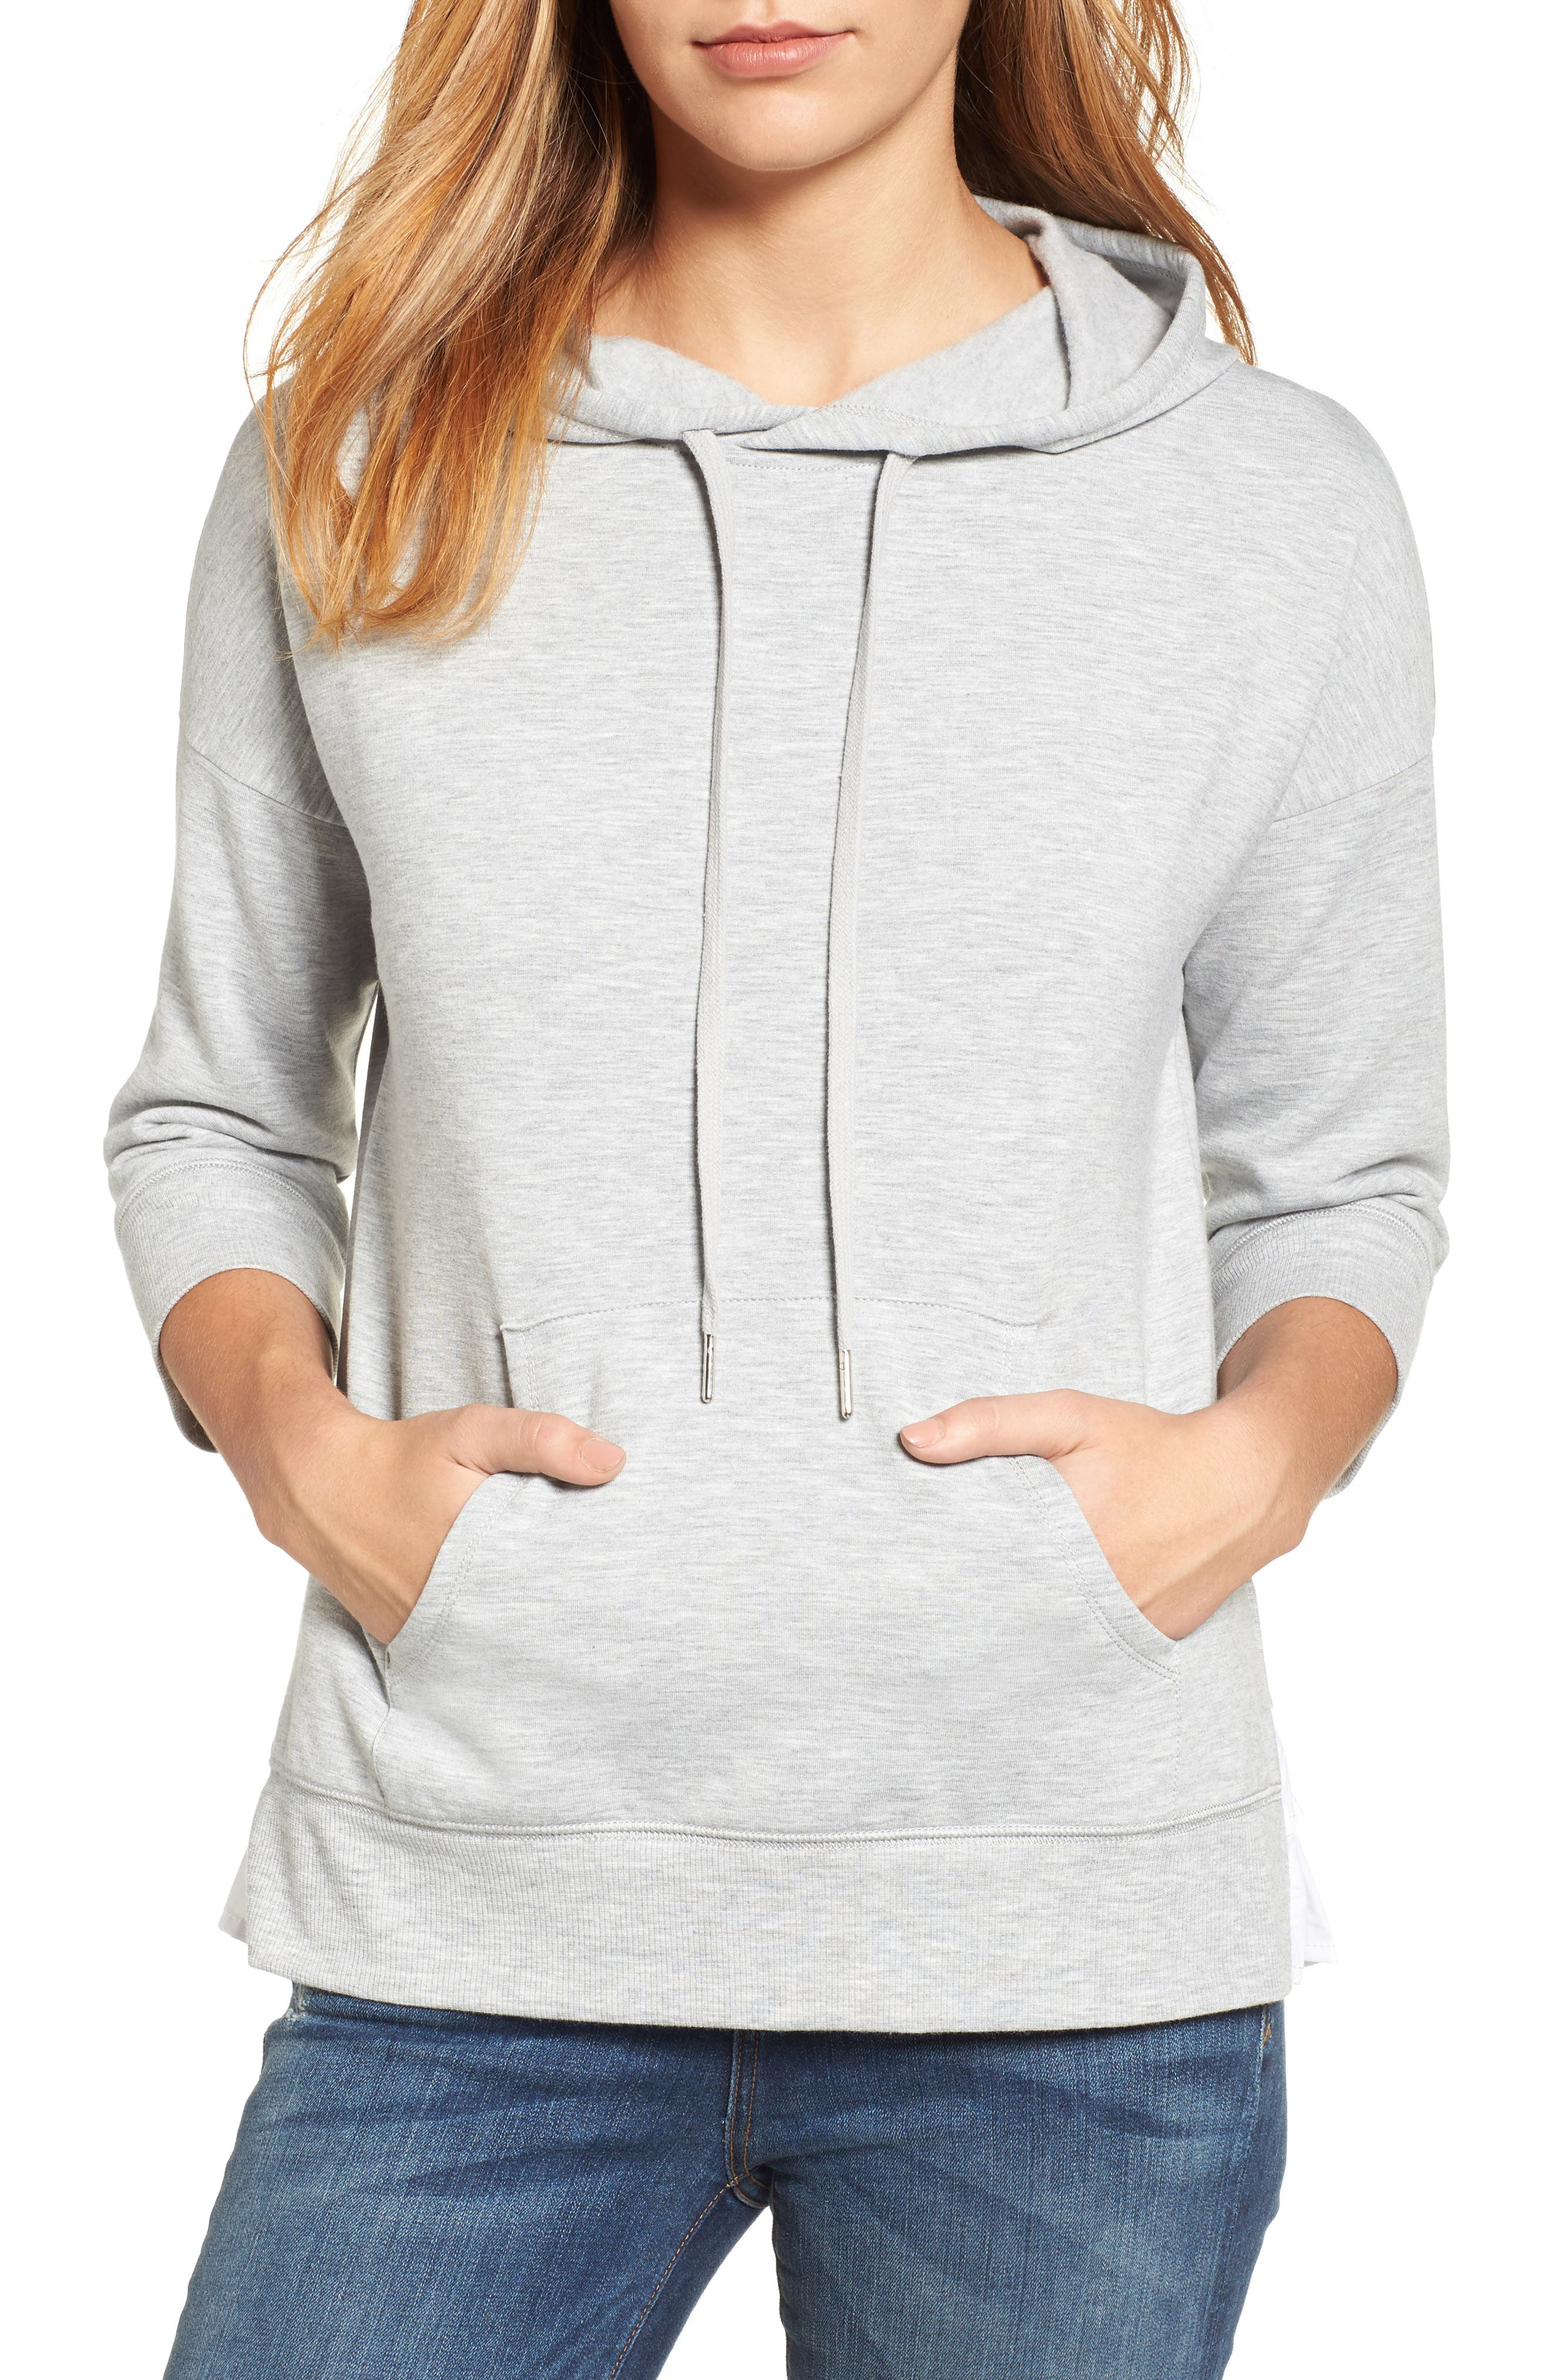 Alternate Image 1 Selected - Caslon® Woven Inset Knit Hoodie (Regular & Petite)